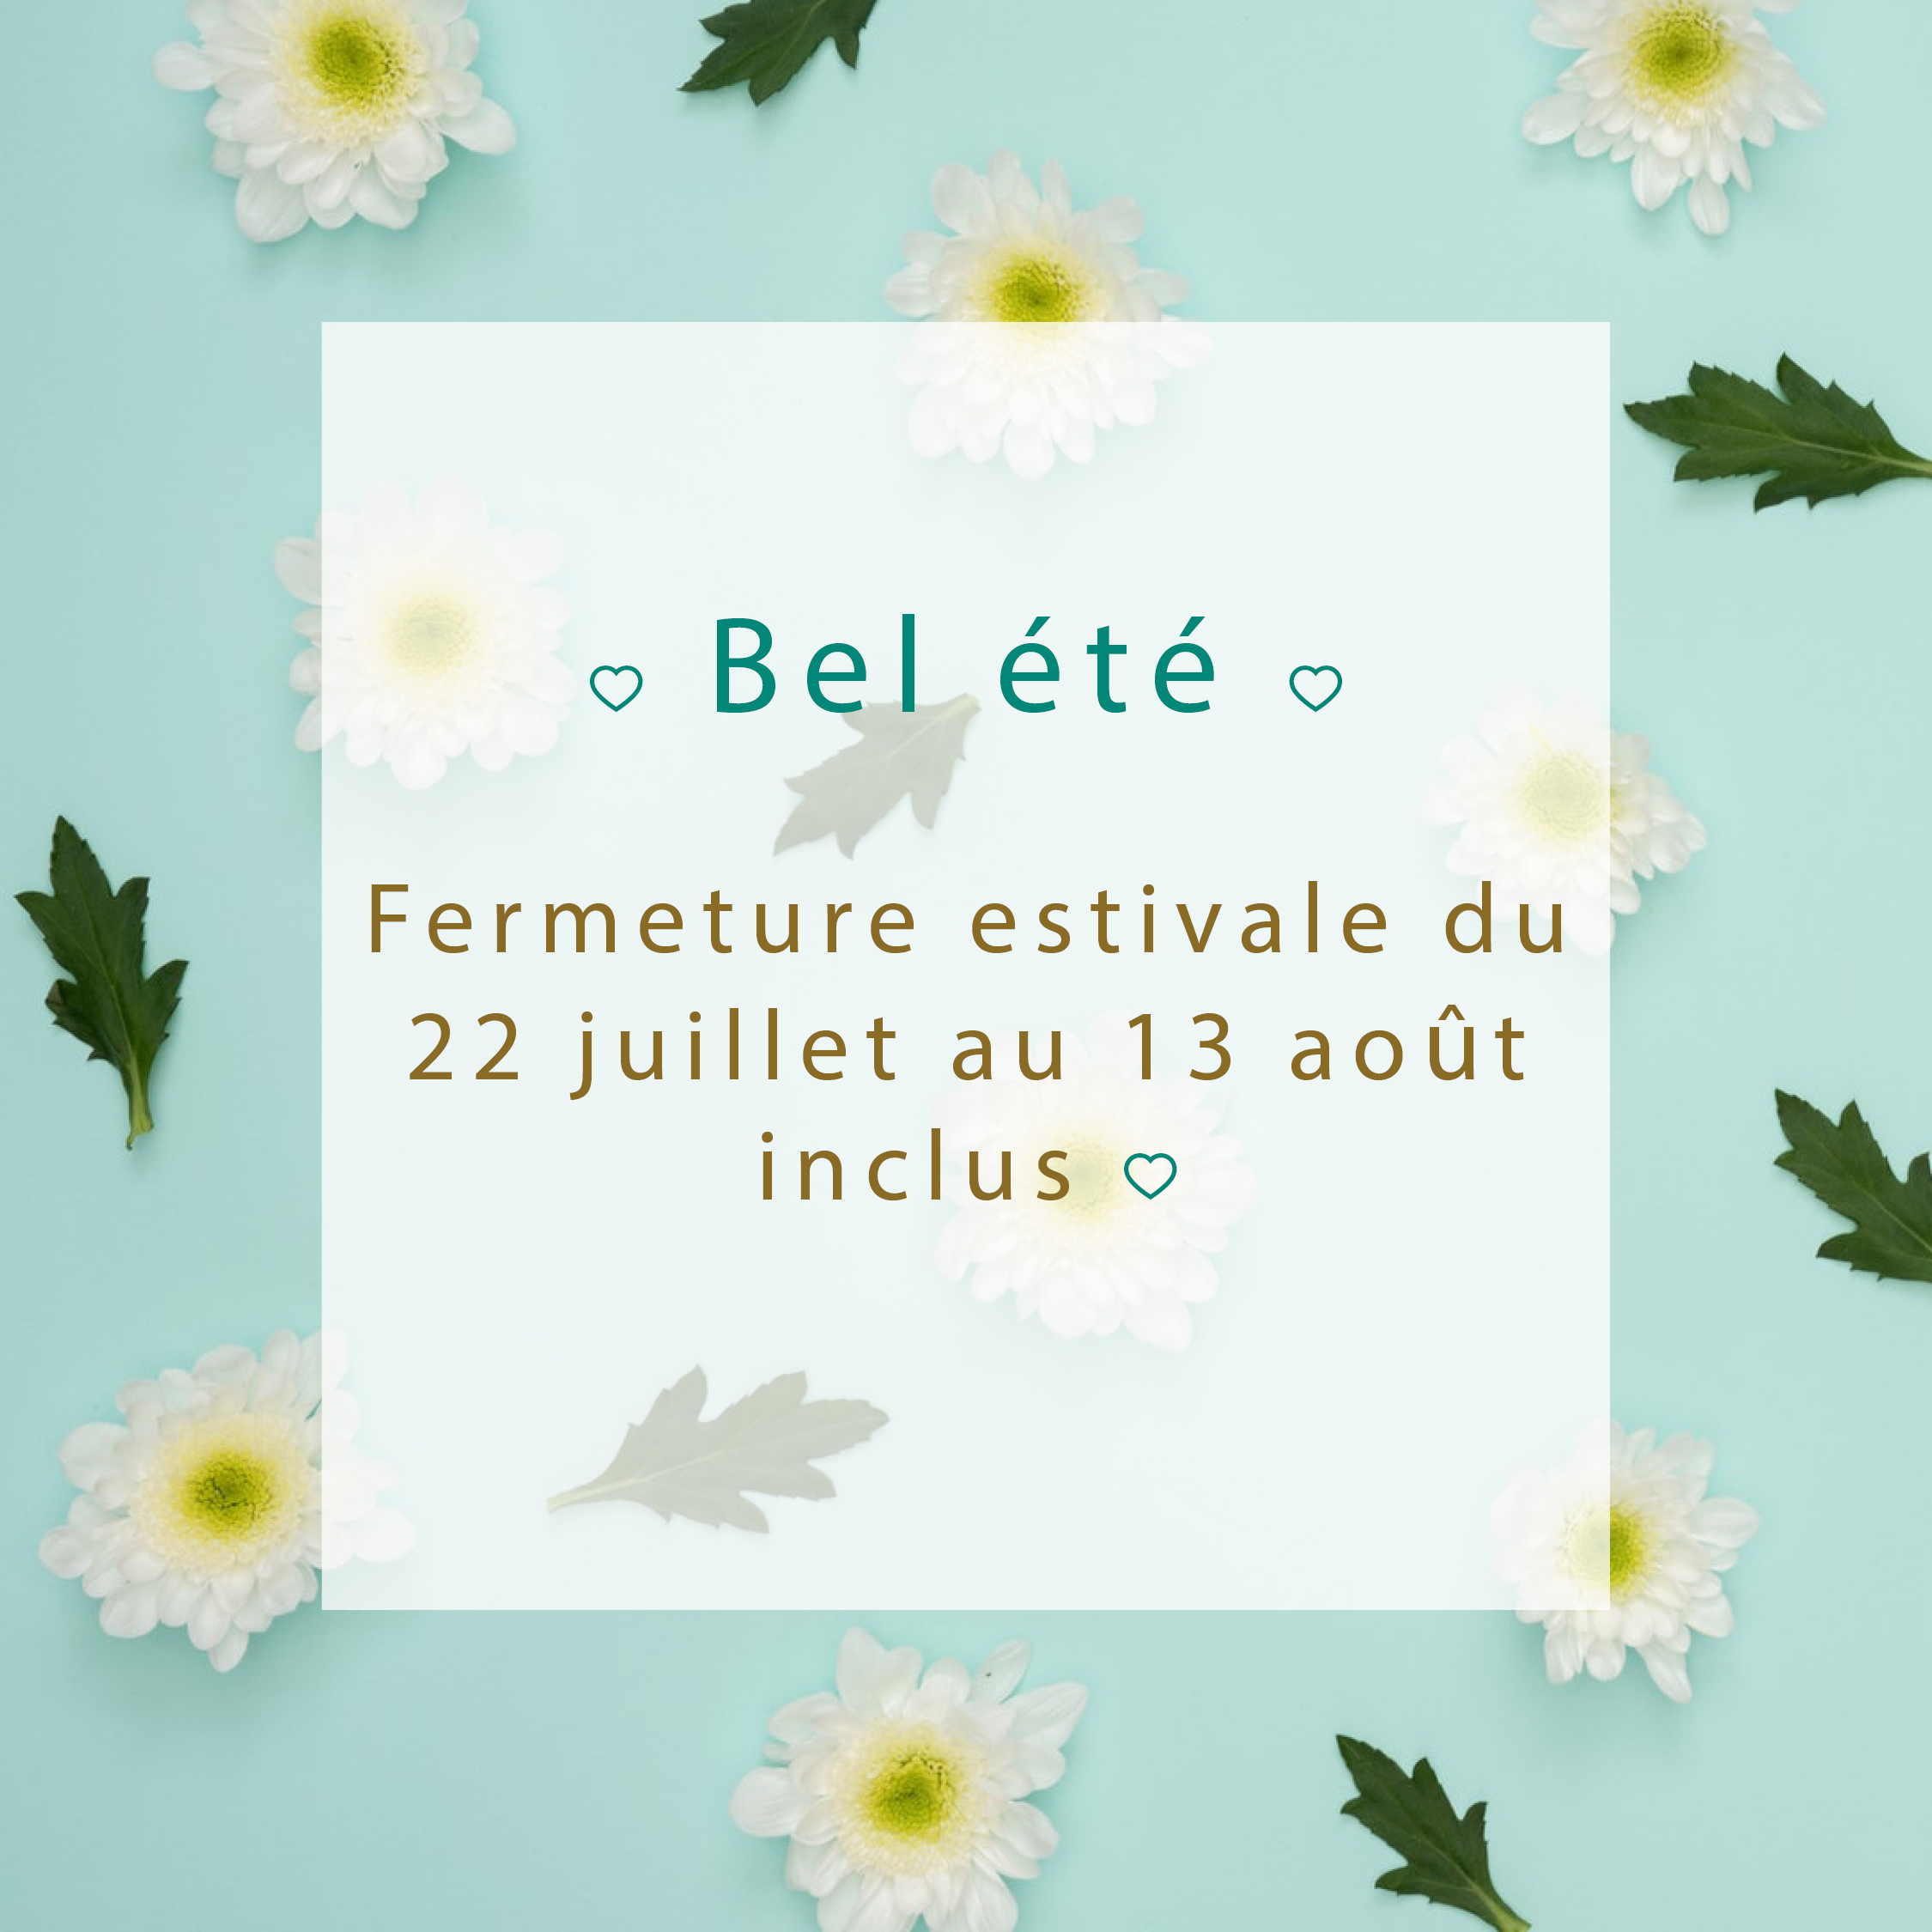 fermeture_estivale2019